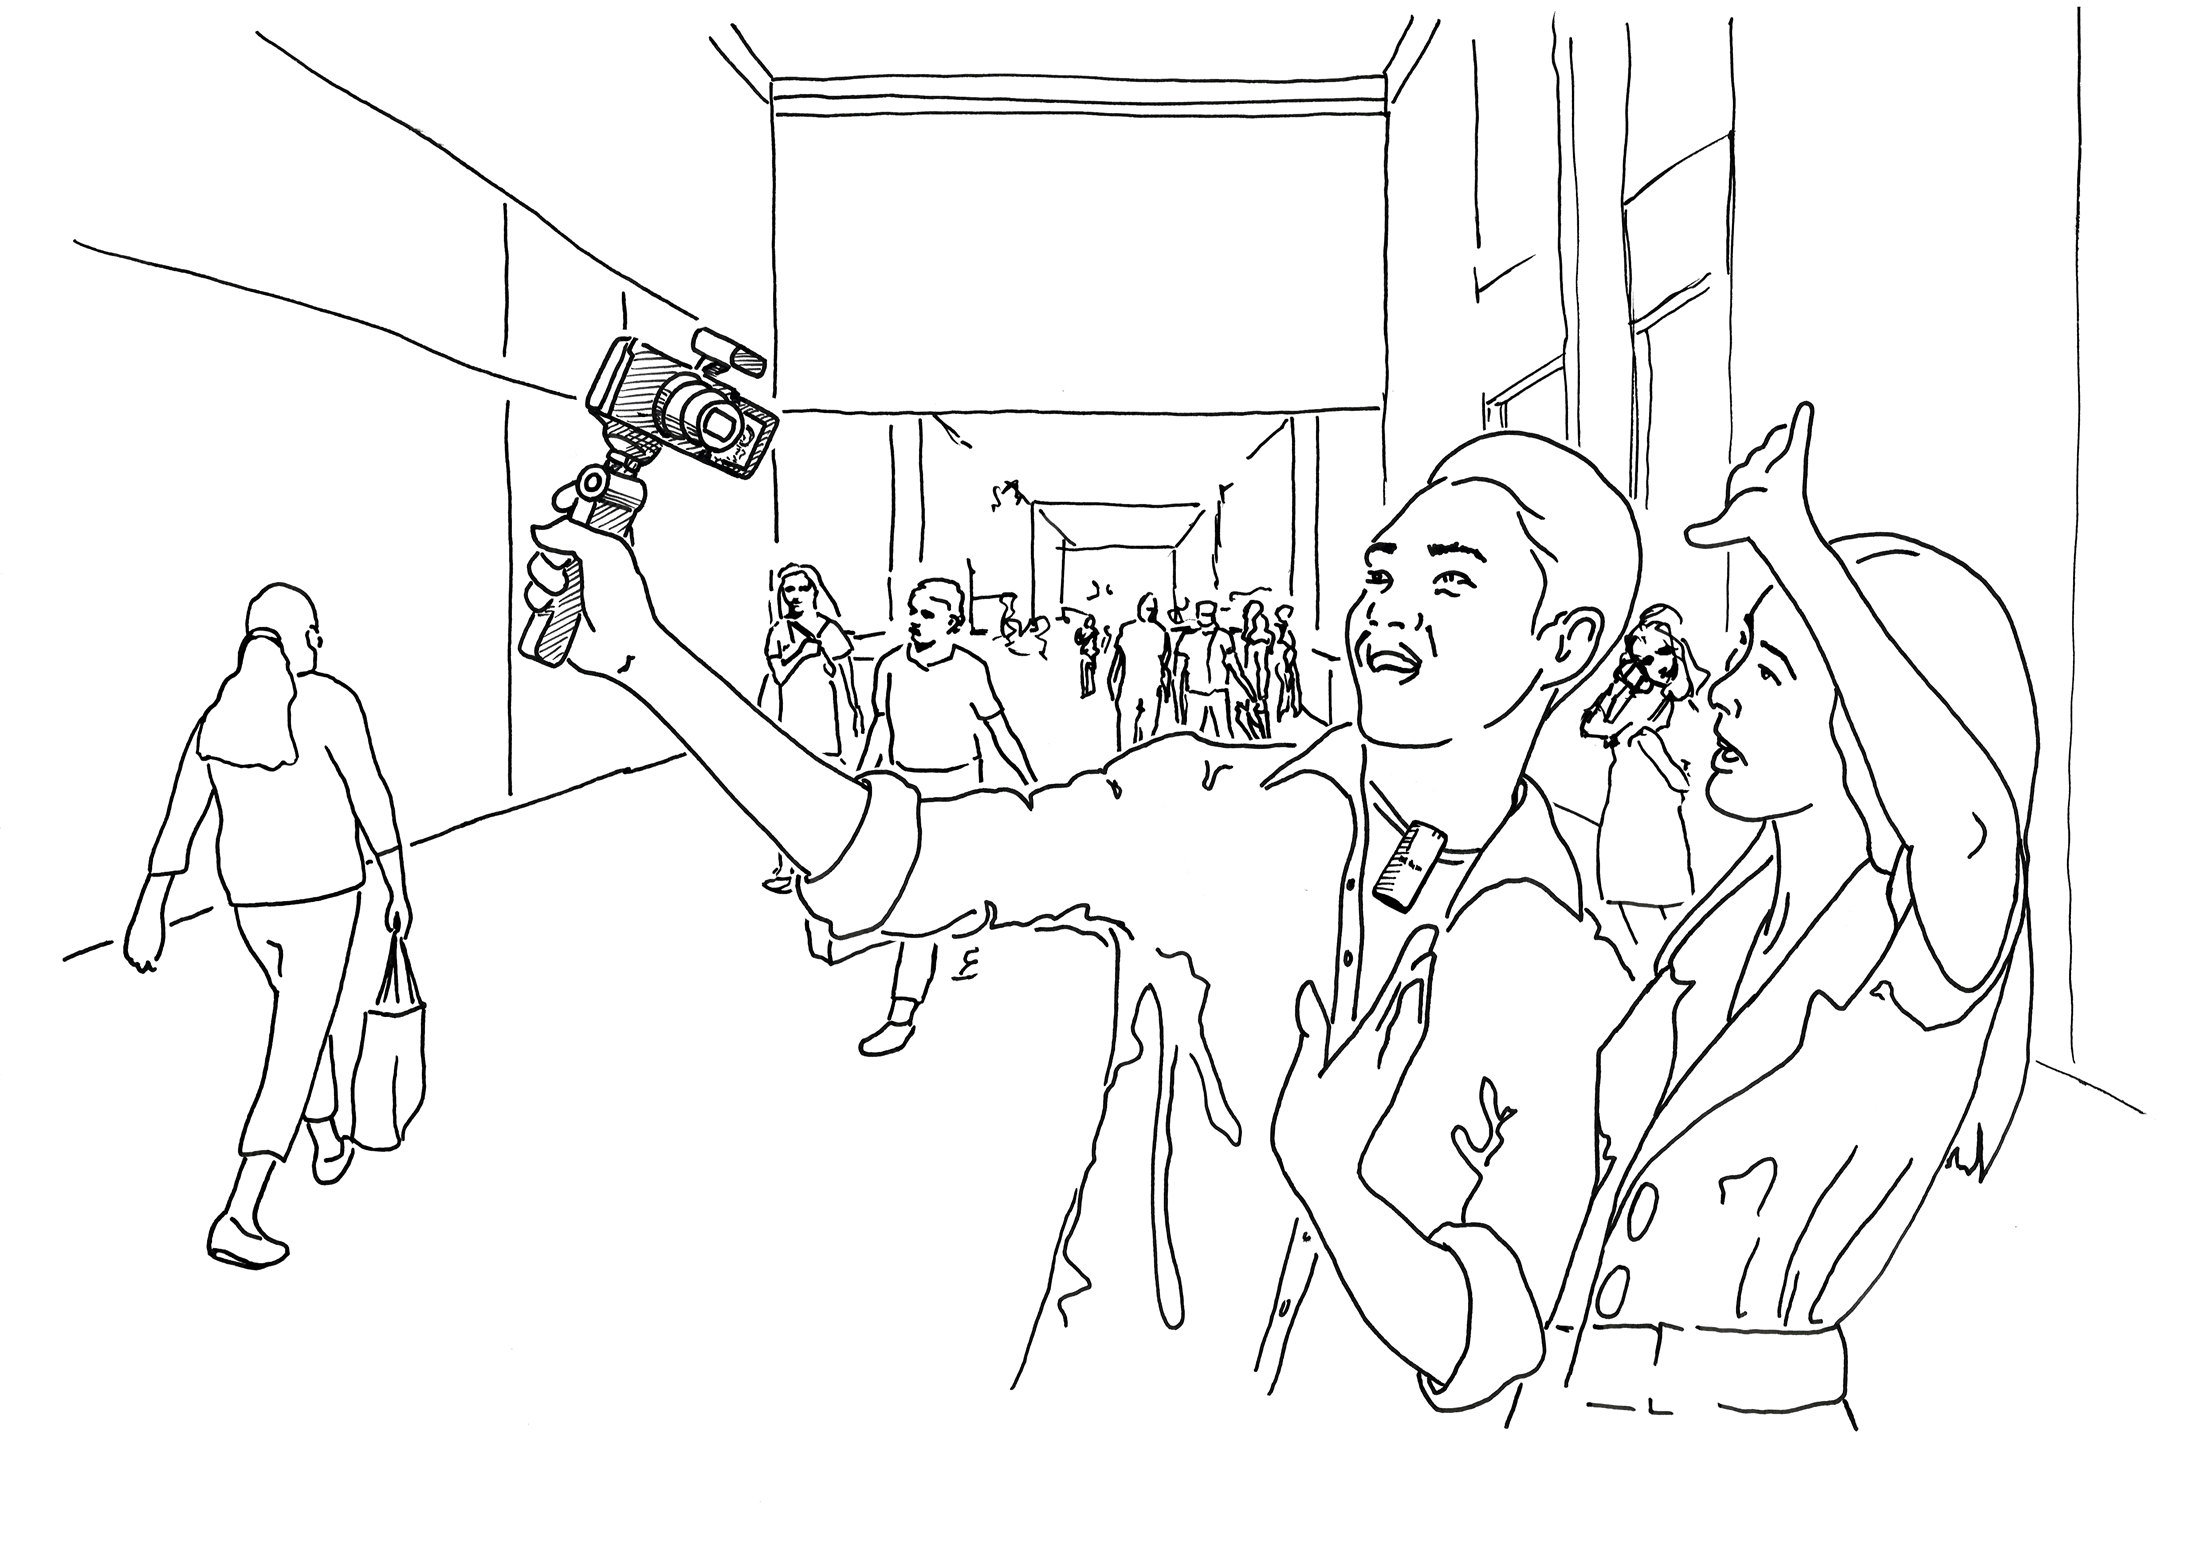 Illustration of Mall Setting